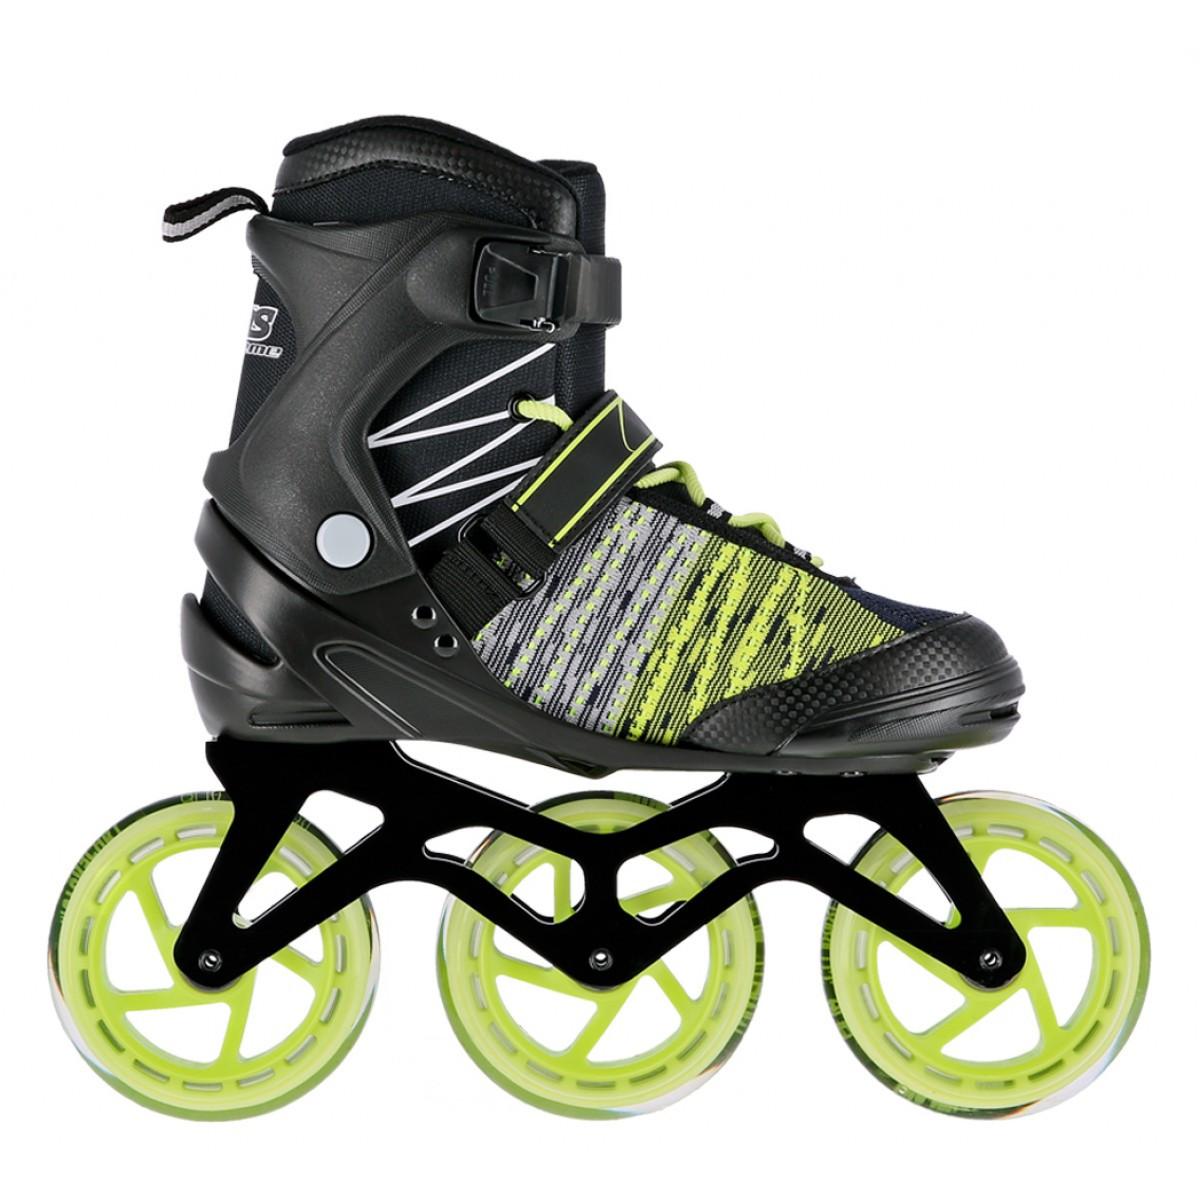 Роликовые коньки Nils Extreme NA1206 Size 41 Black/Green